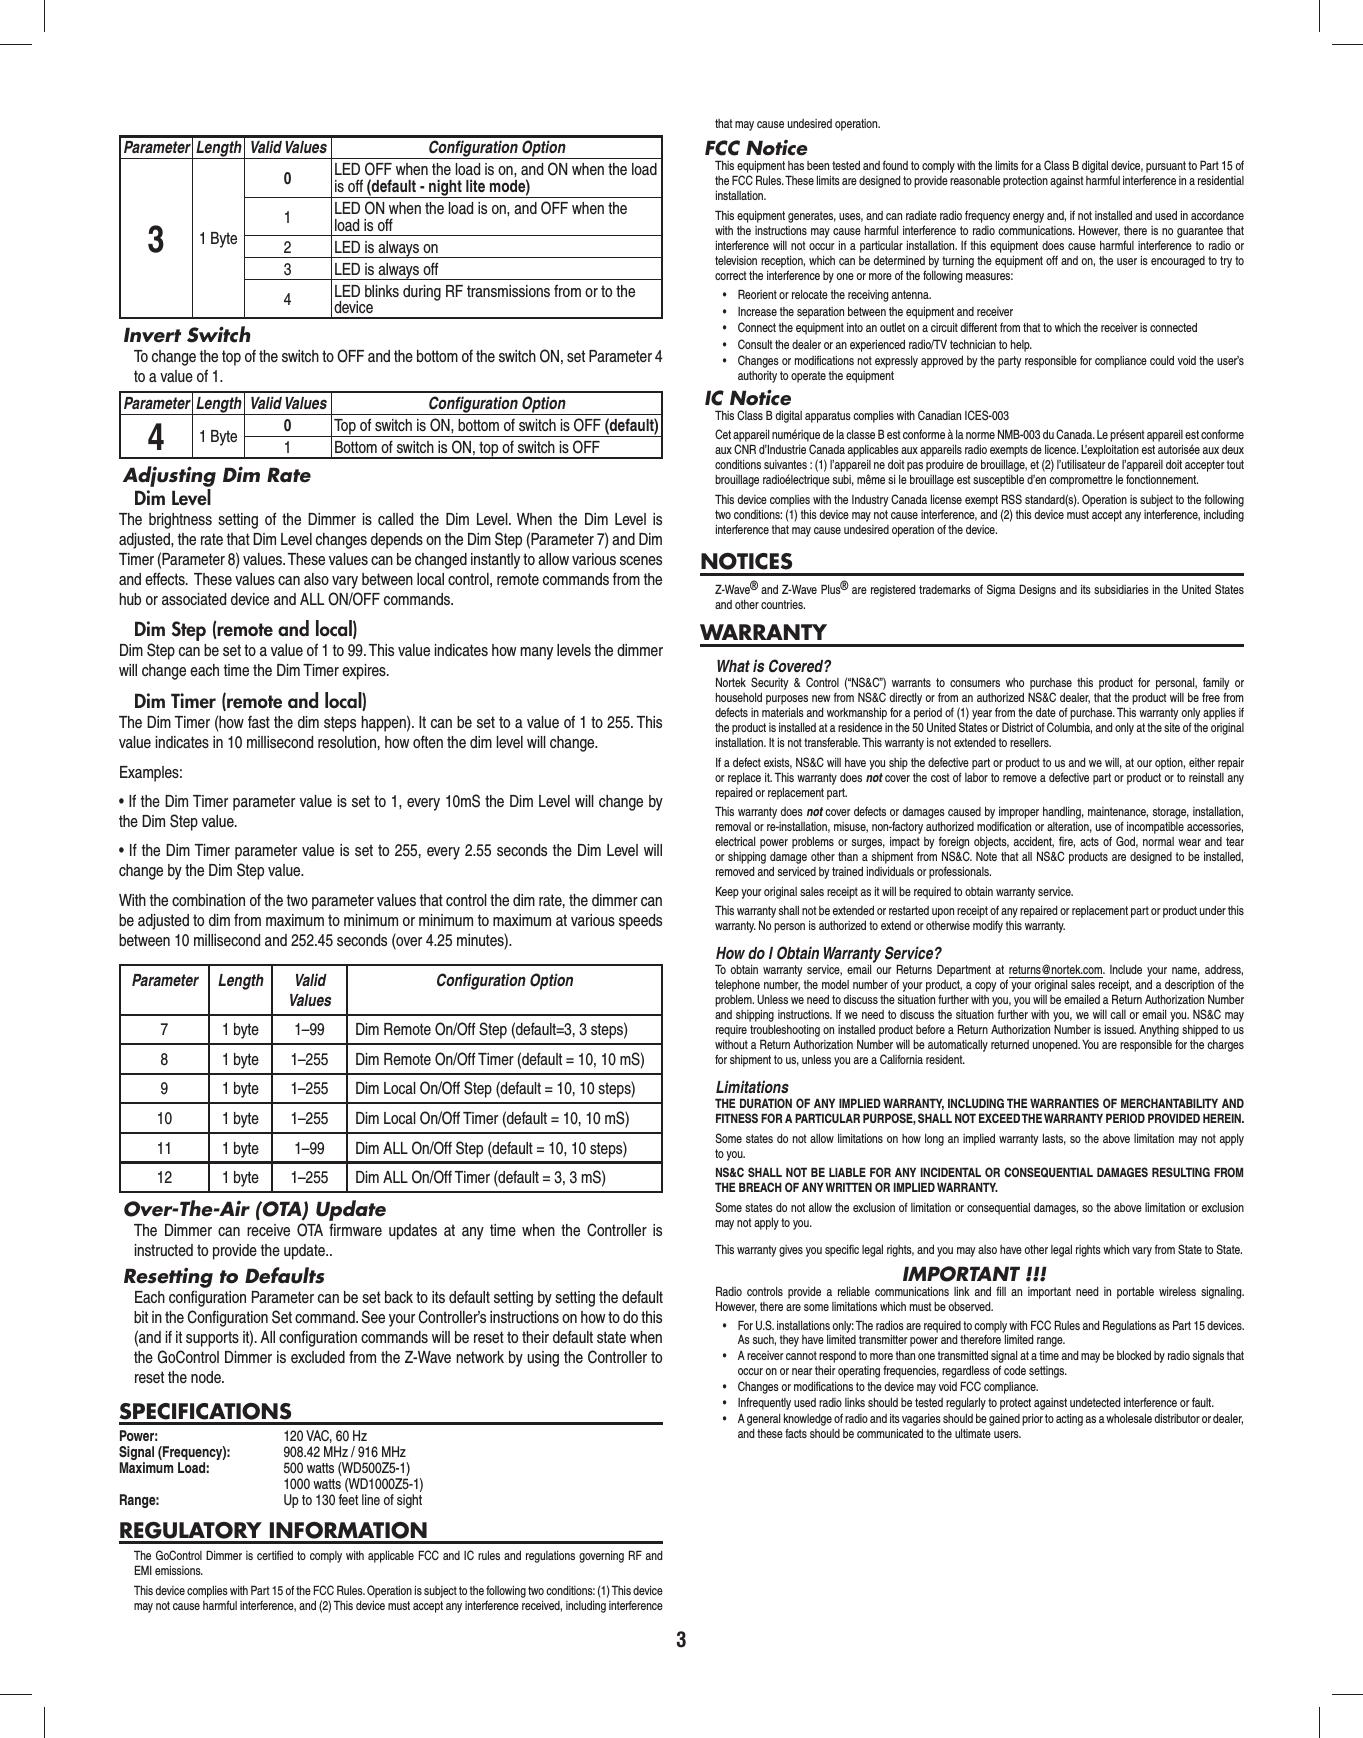 Plumbology Llc Upc 908 2 Manual Guide